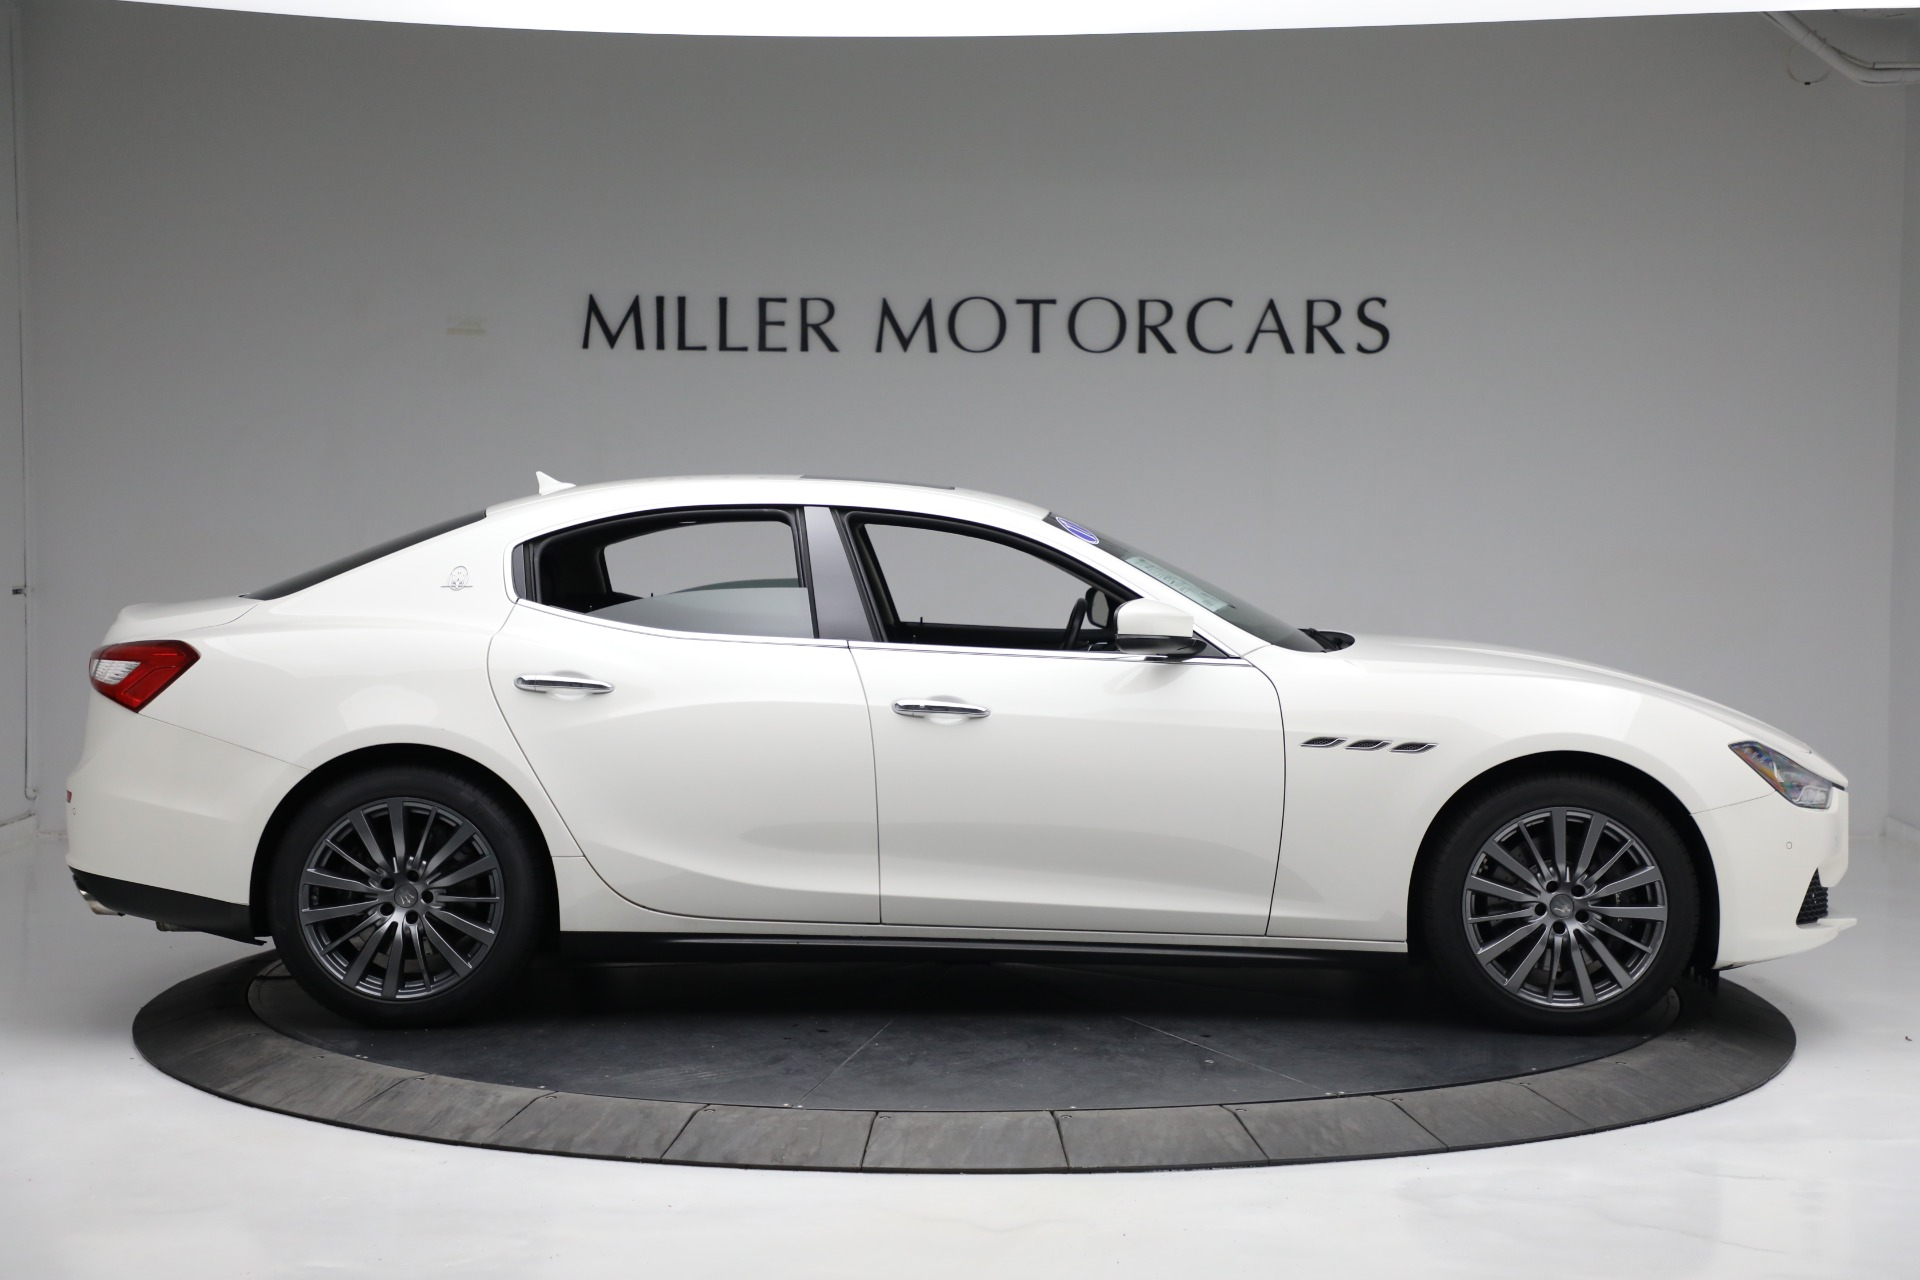 New 2017 Maserati Ghibli S Q4 EX-Loaner For Sale In Greenwich, CT 1019_p9